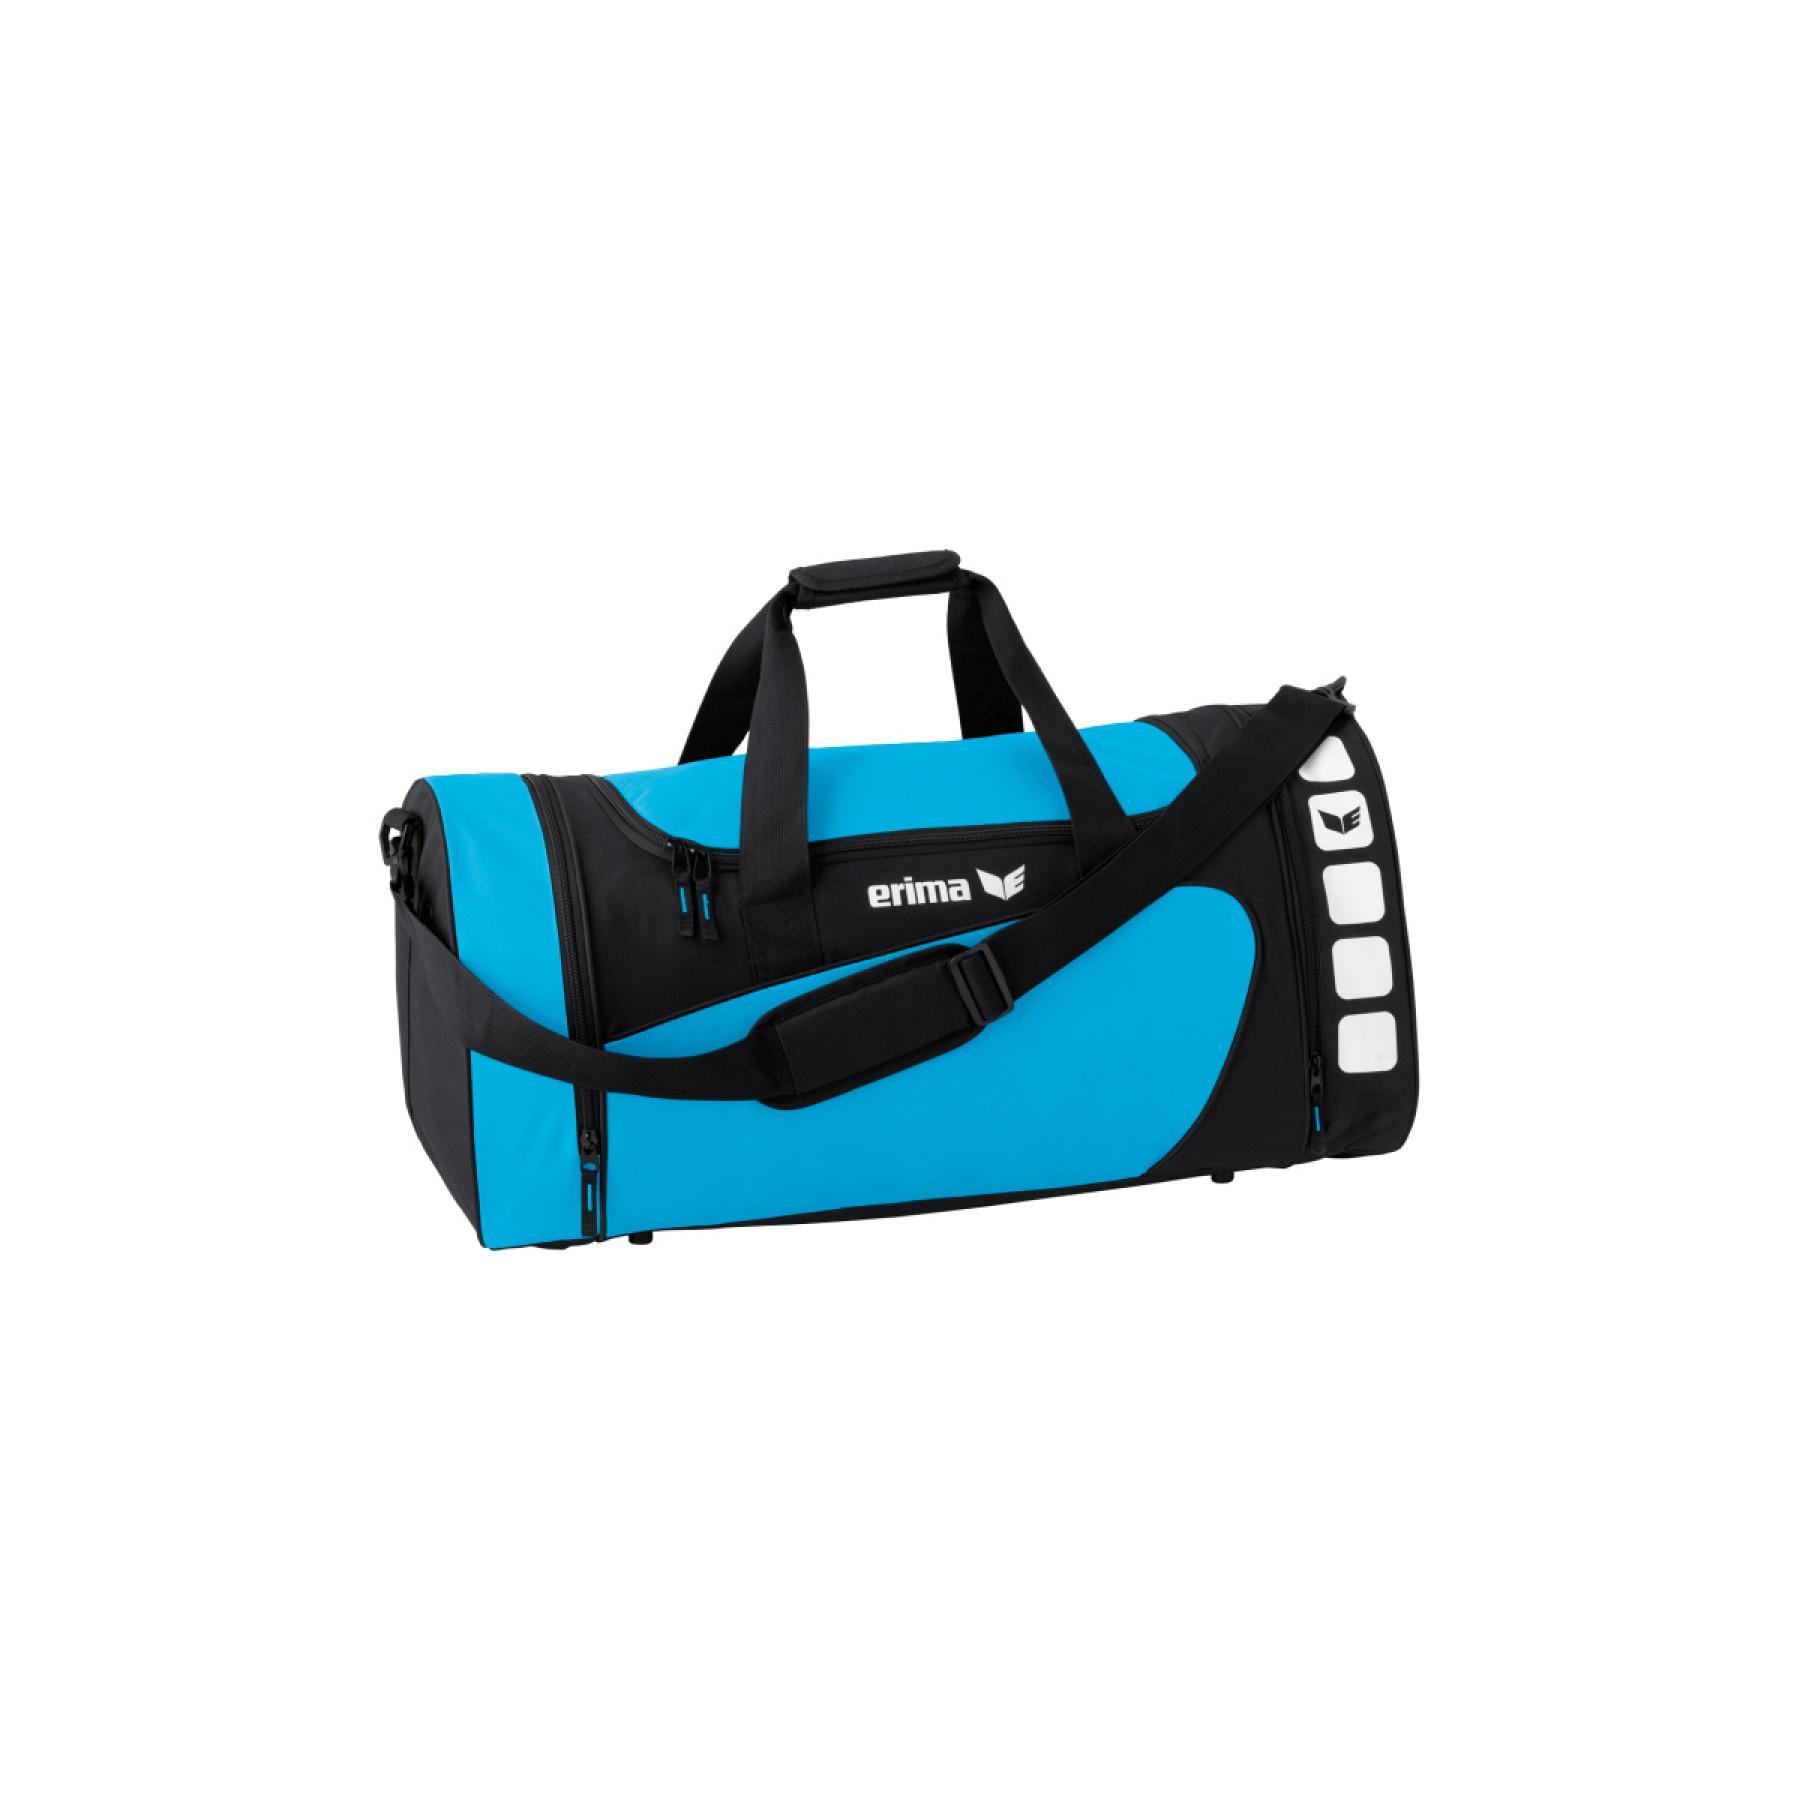 Sports bag Erima Club 5 line